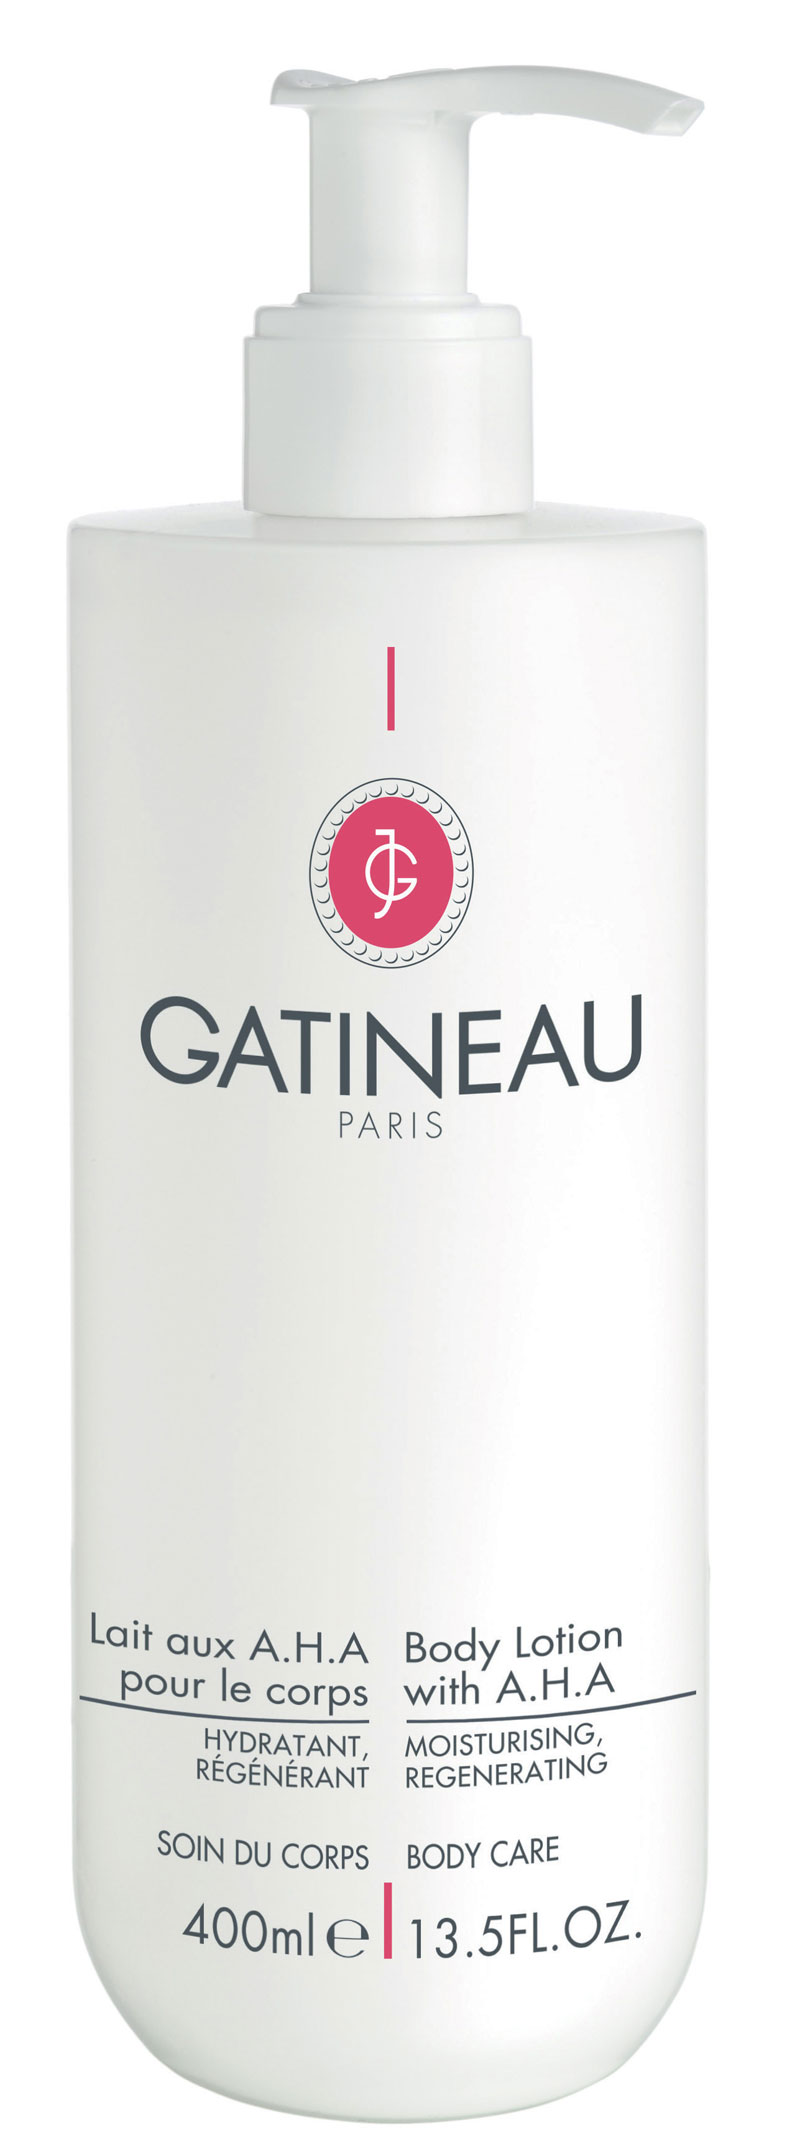 GATINEAU (PARIS) представляет BODY LOTION WITH A.H.A.